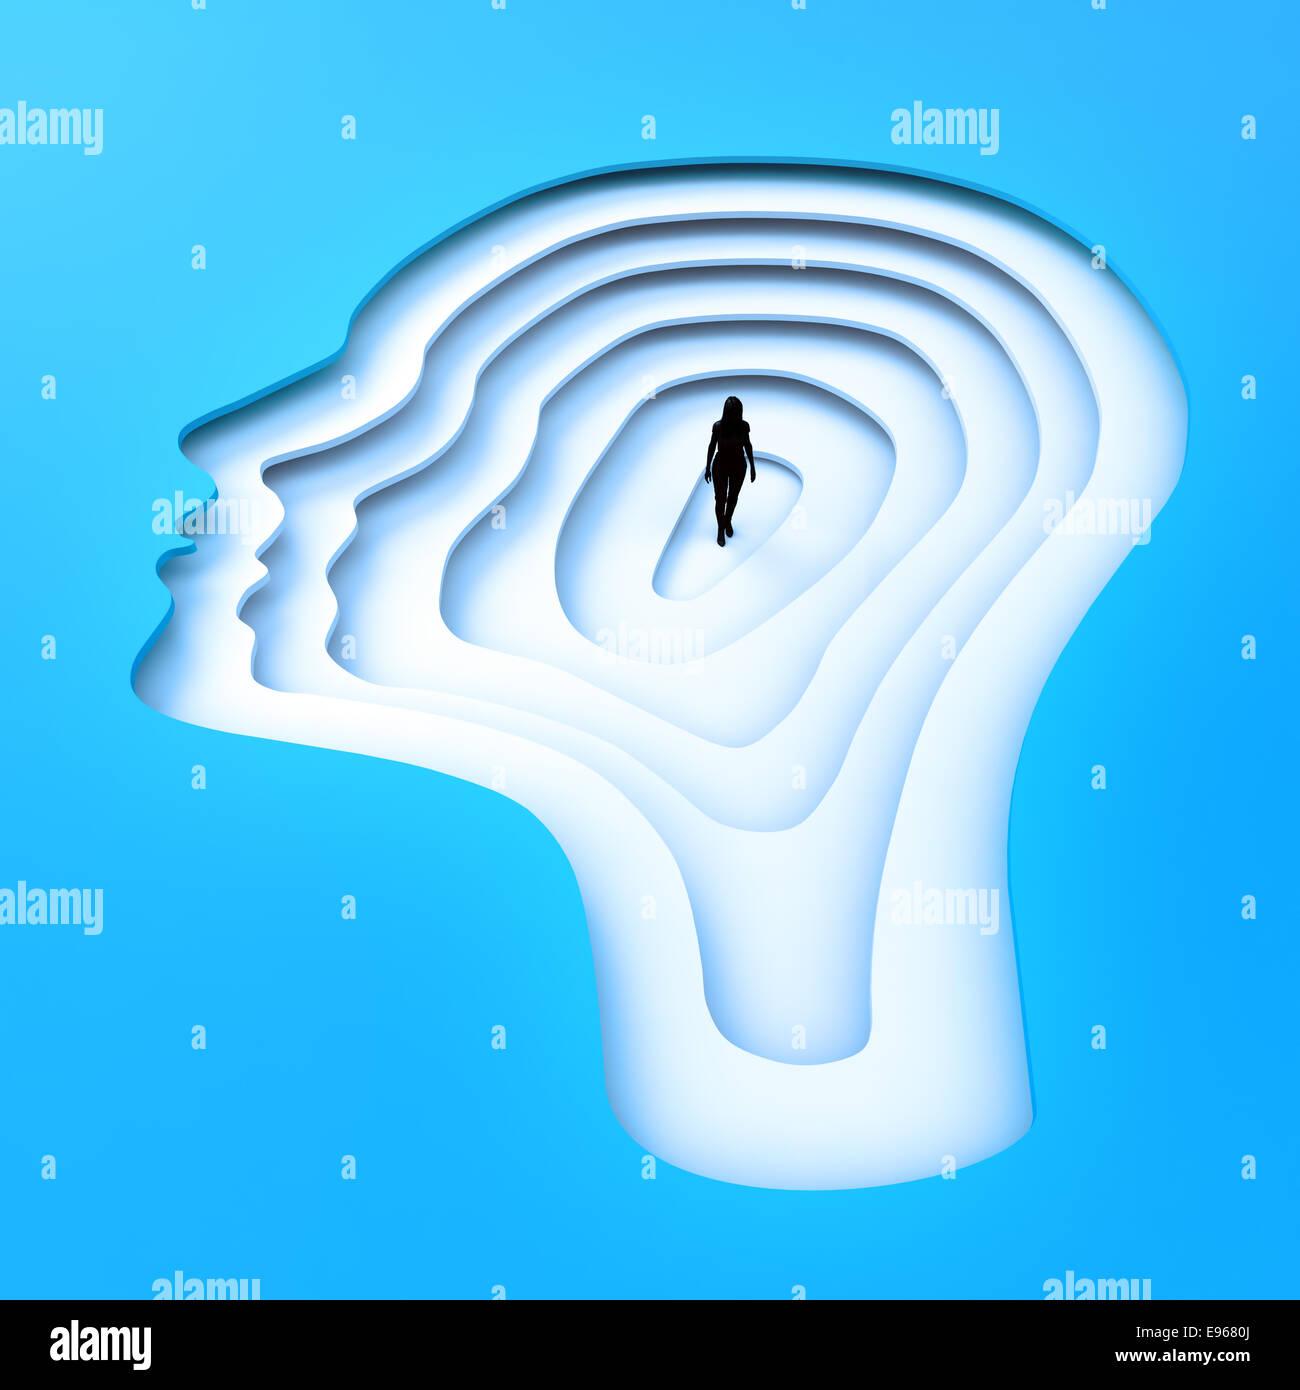 Persona minúscula de pie dentro de una cabeza femenina silueta. Imagen De Stock